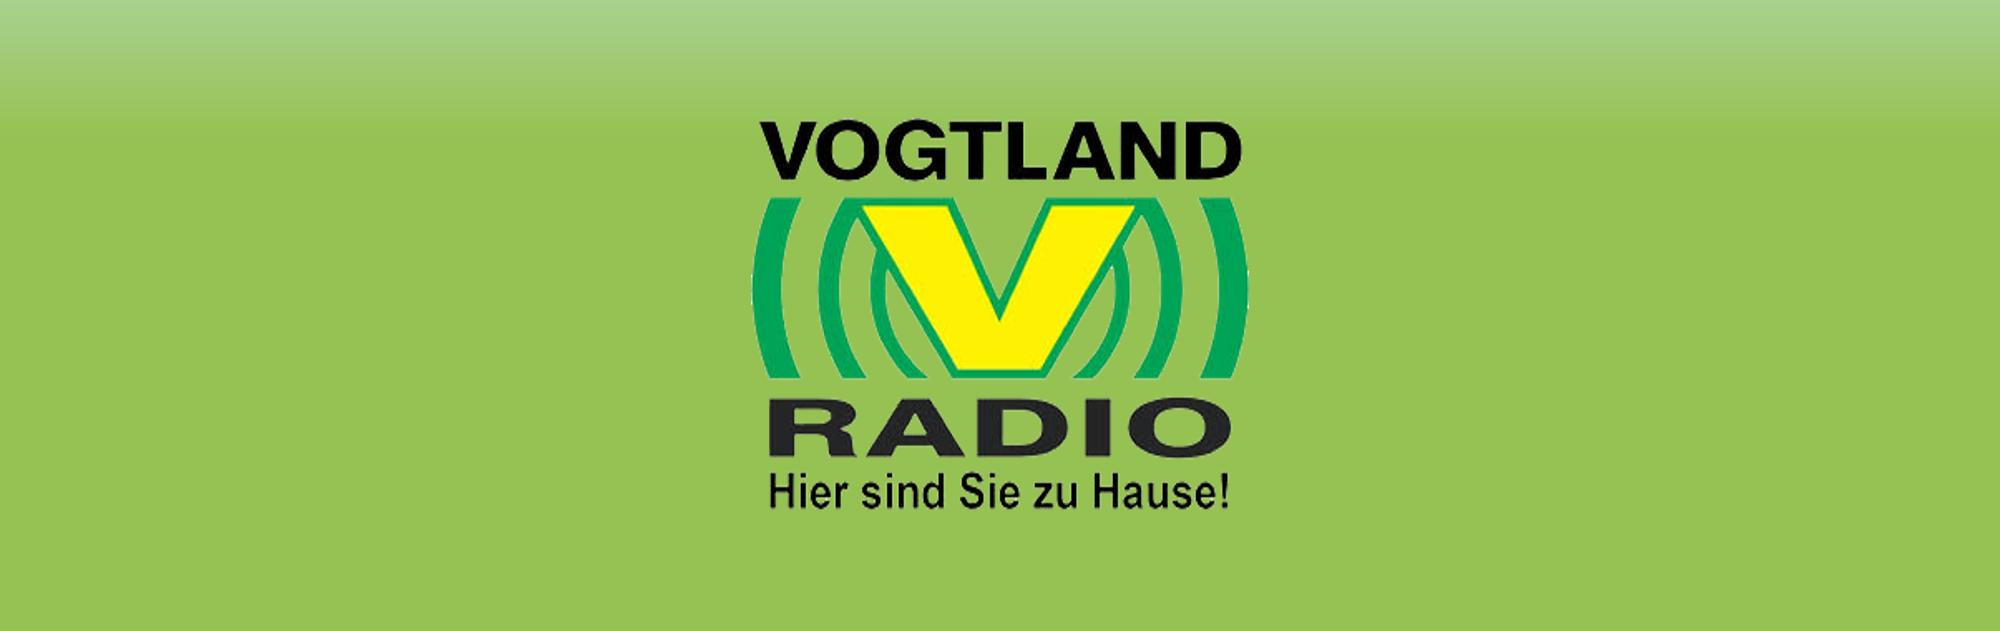 Vogtlandradio_grün_schmal_2